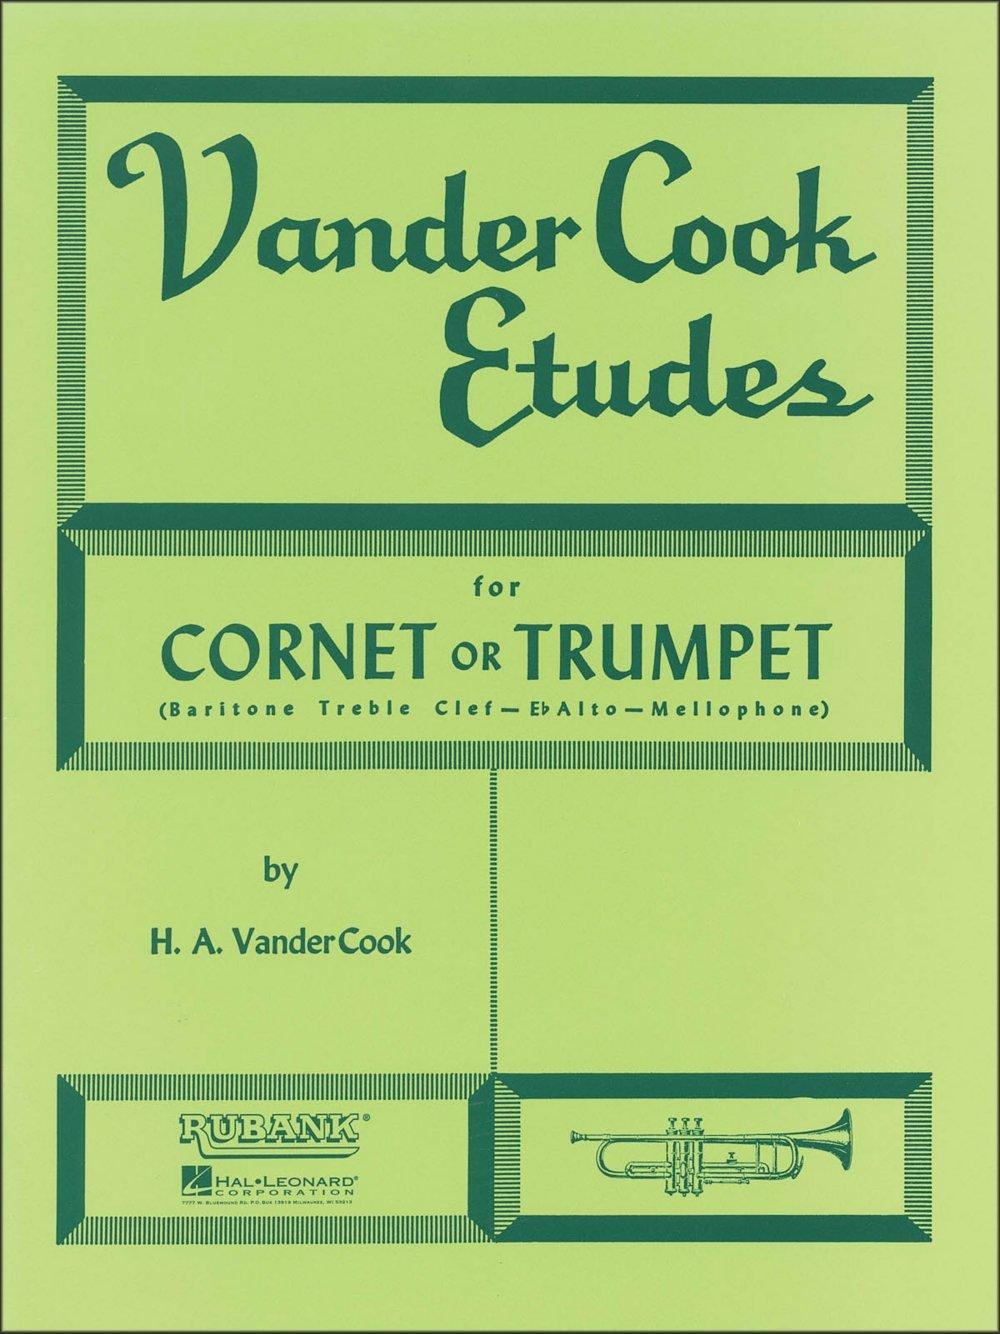 Hal Leonard Rubank Vandercook Etudes for Cornet Or Trumpet pdf